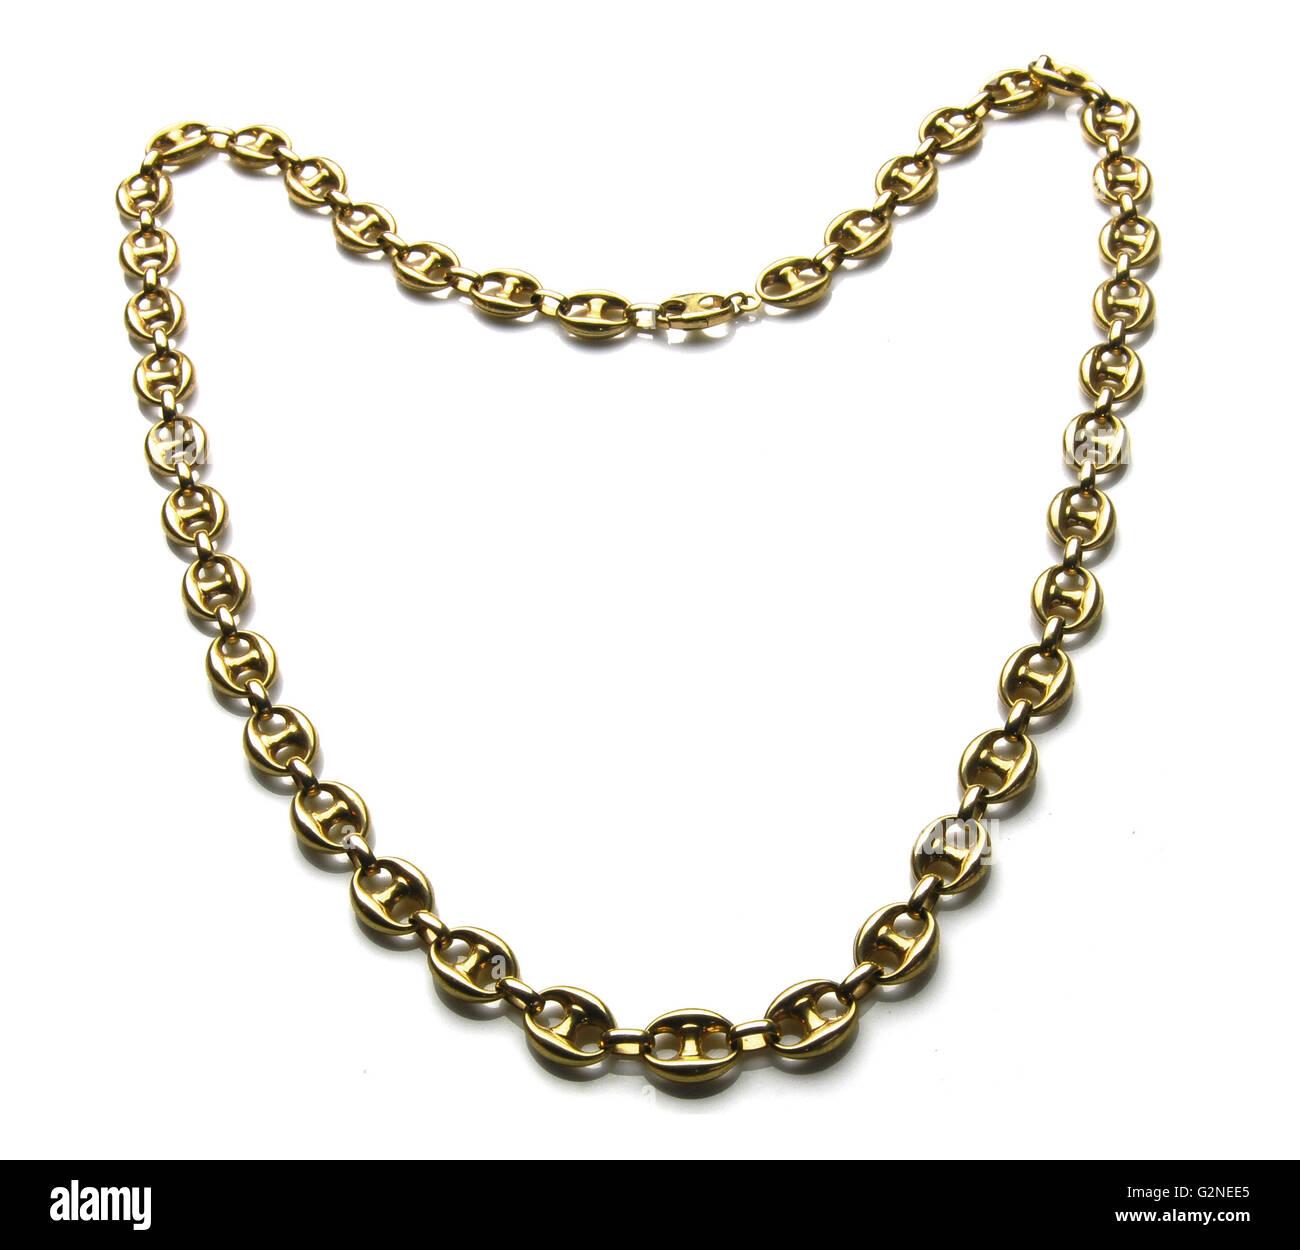 440a3e8d21c5 Gold Chain Necklace Stock Photos   Gold Chain Necklace Stock Images ...